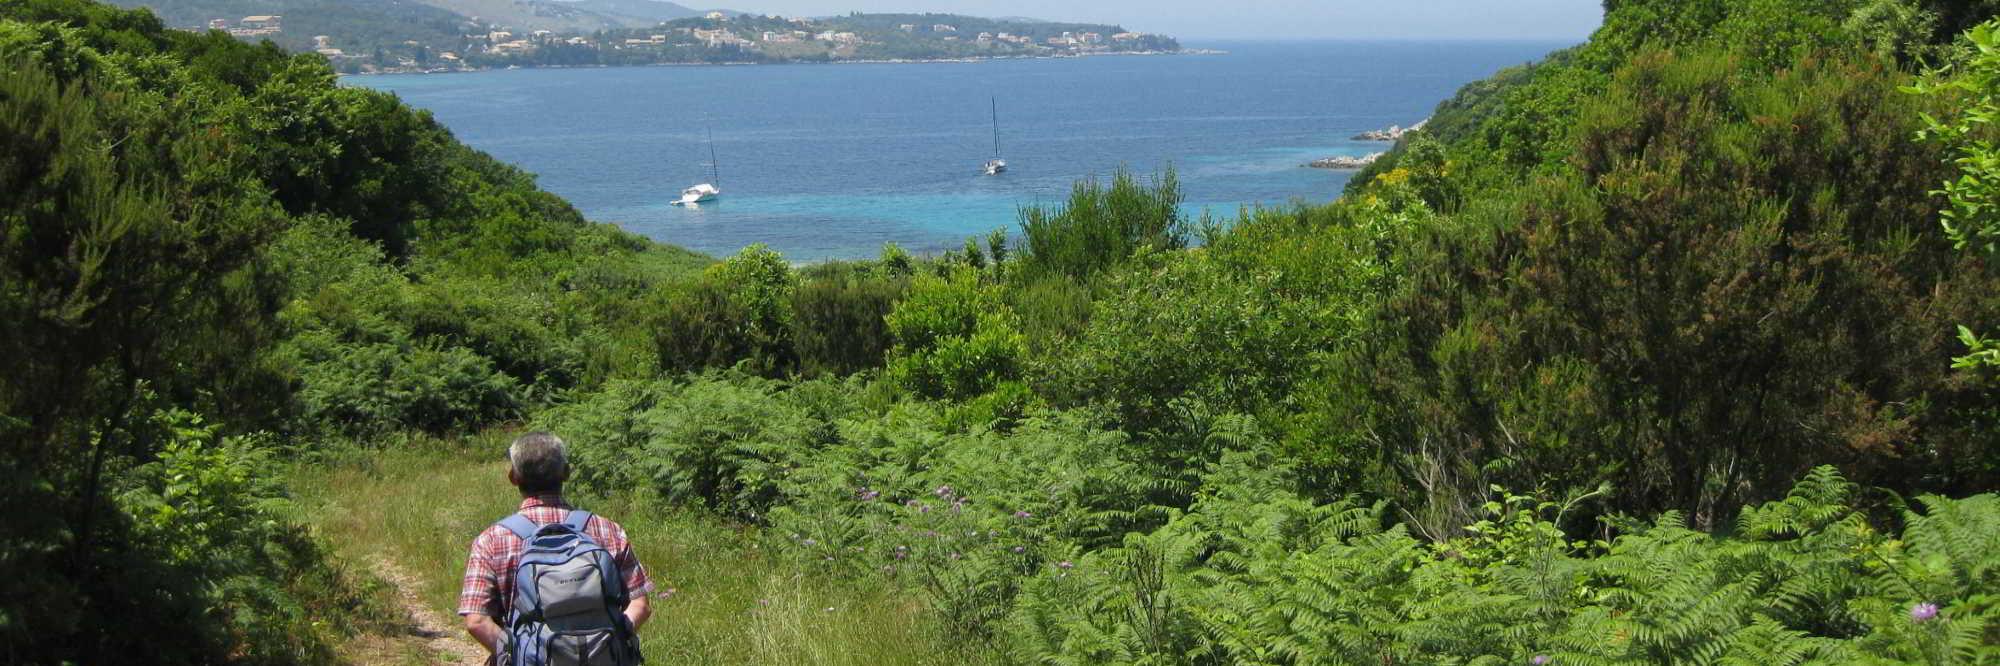 headerfoto Corfu Trail